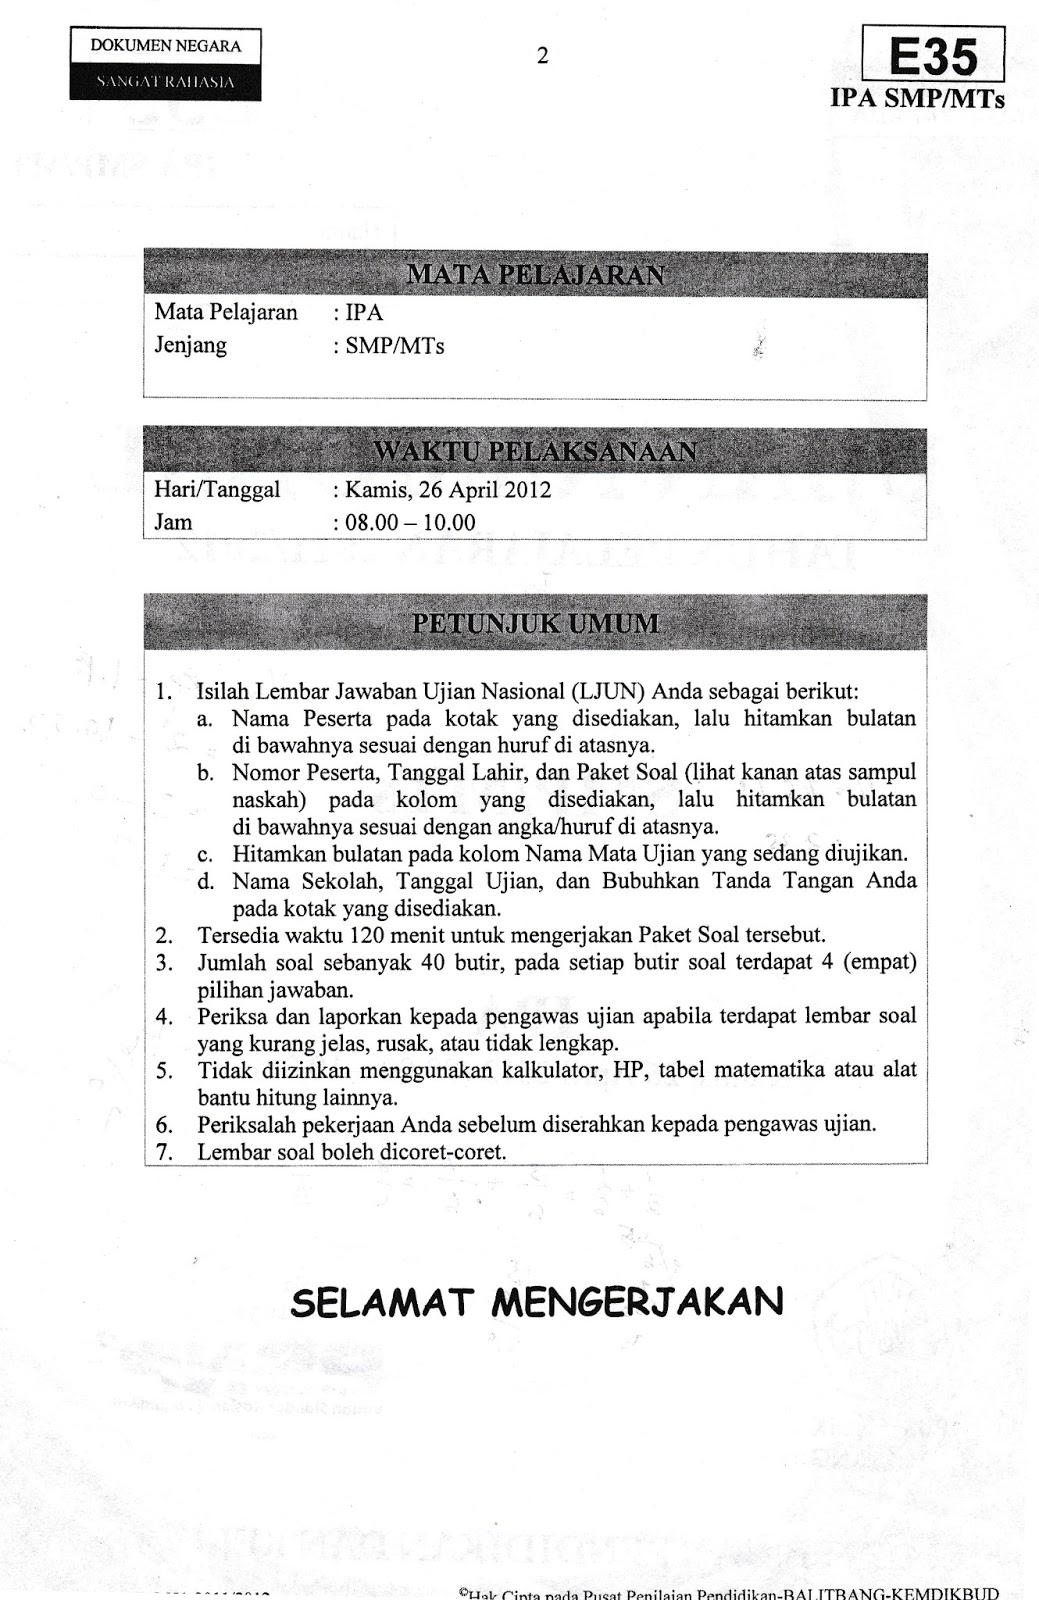 Soal Dan Pembahasan Un Ipa Smp Paket E35 Tahun 2012 Hendri Kuncahyo